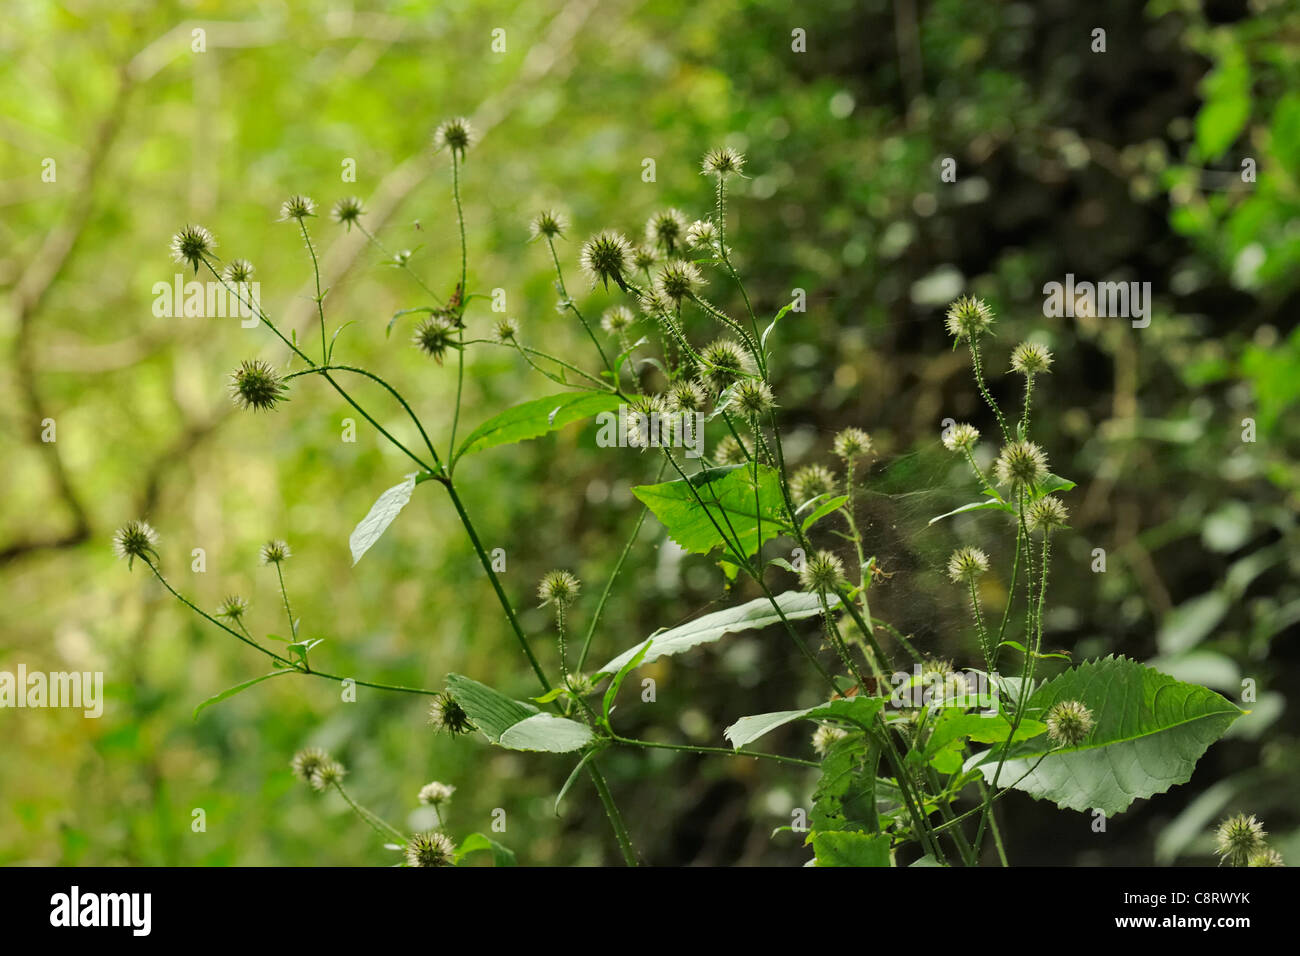 Small Teasel, dipsacus pilosus - Stock Image